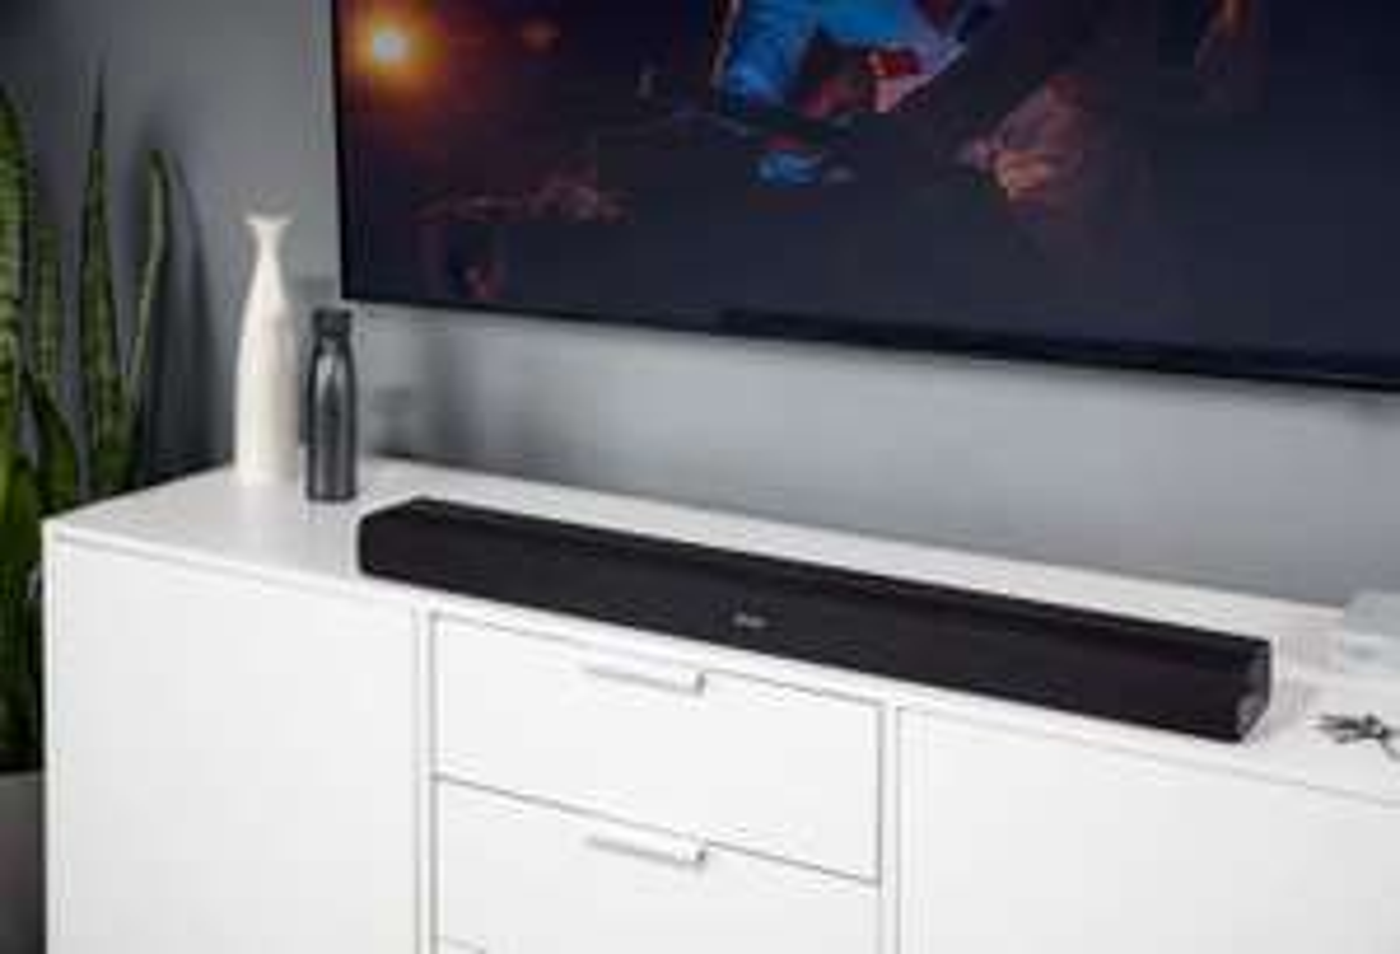 Denon DHT-S216 2.1 TV Soundbar mit integriertem Subwoofer, Bluetooth, HMDI ARC, 4K UHD, Dolby Digital, DTS, DTS Virtual:X [Amazon]